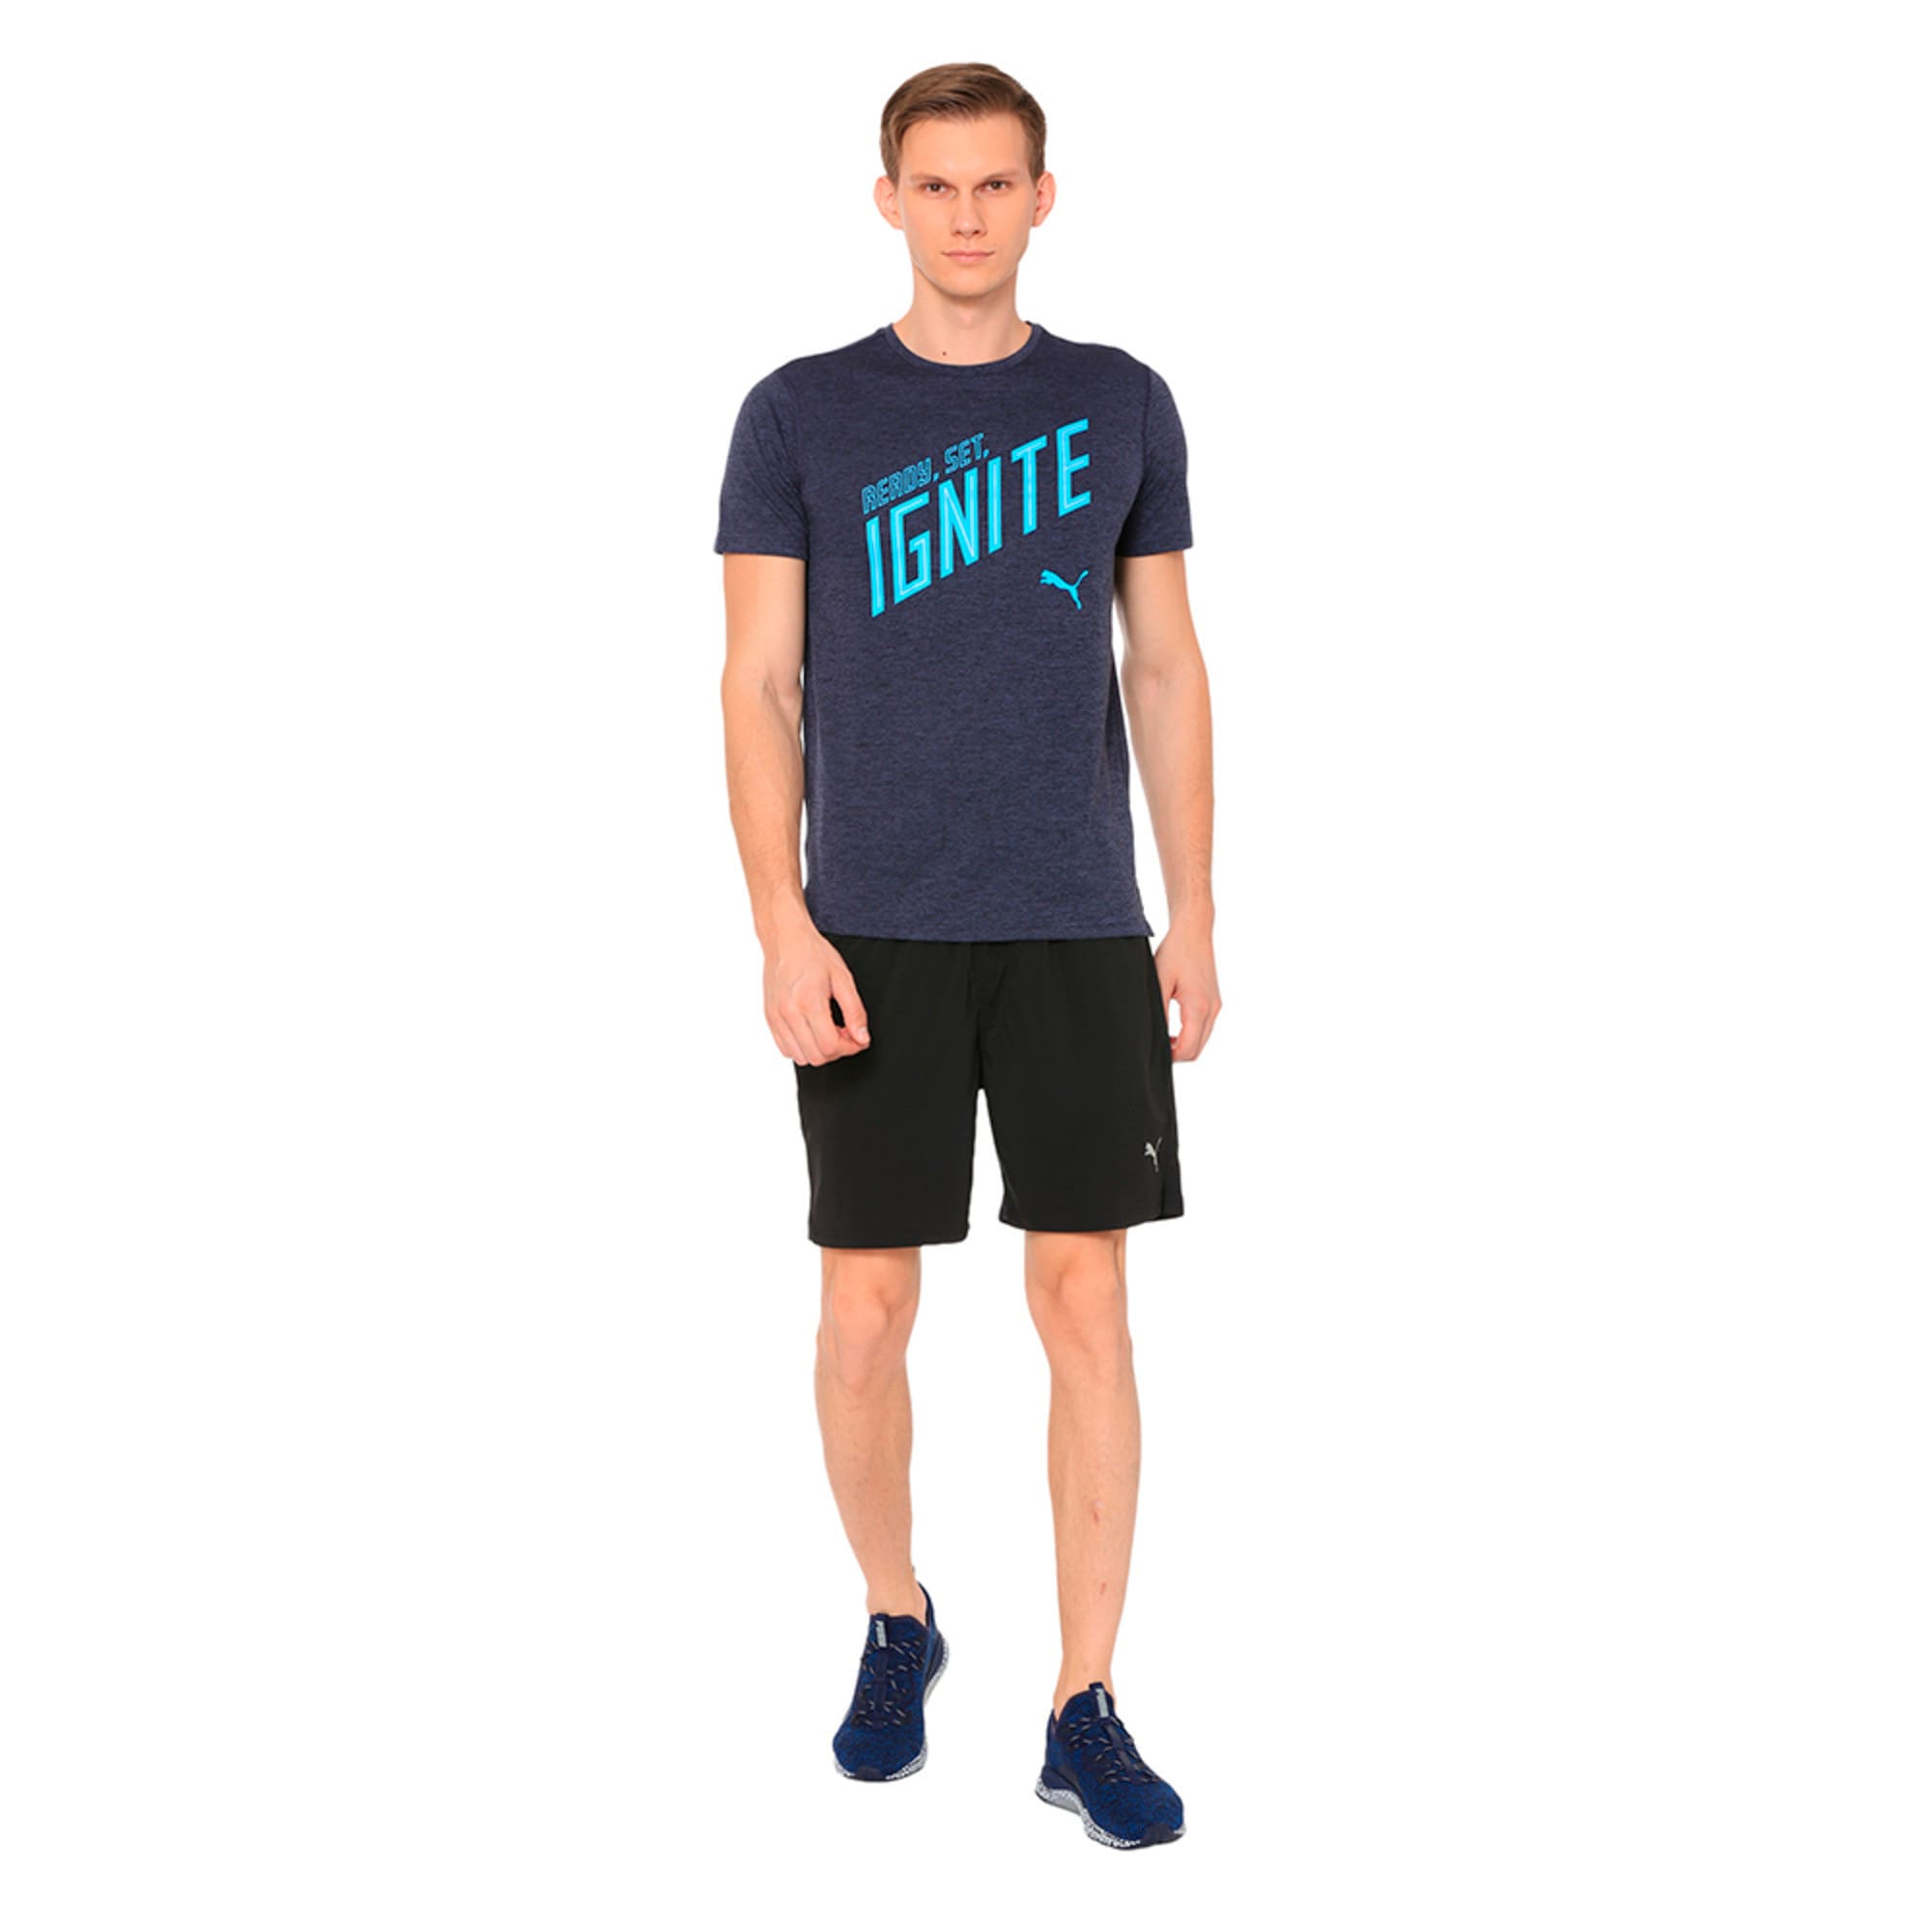 Thumbnail 3 of Running Men's IGNITE 2-in-1 Shorts, Puma Black, medium-IND